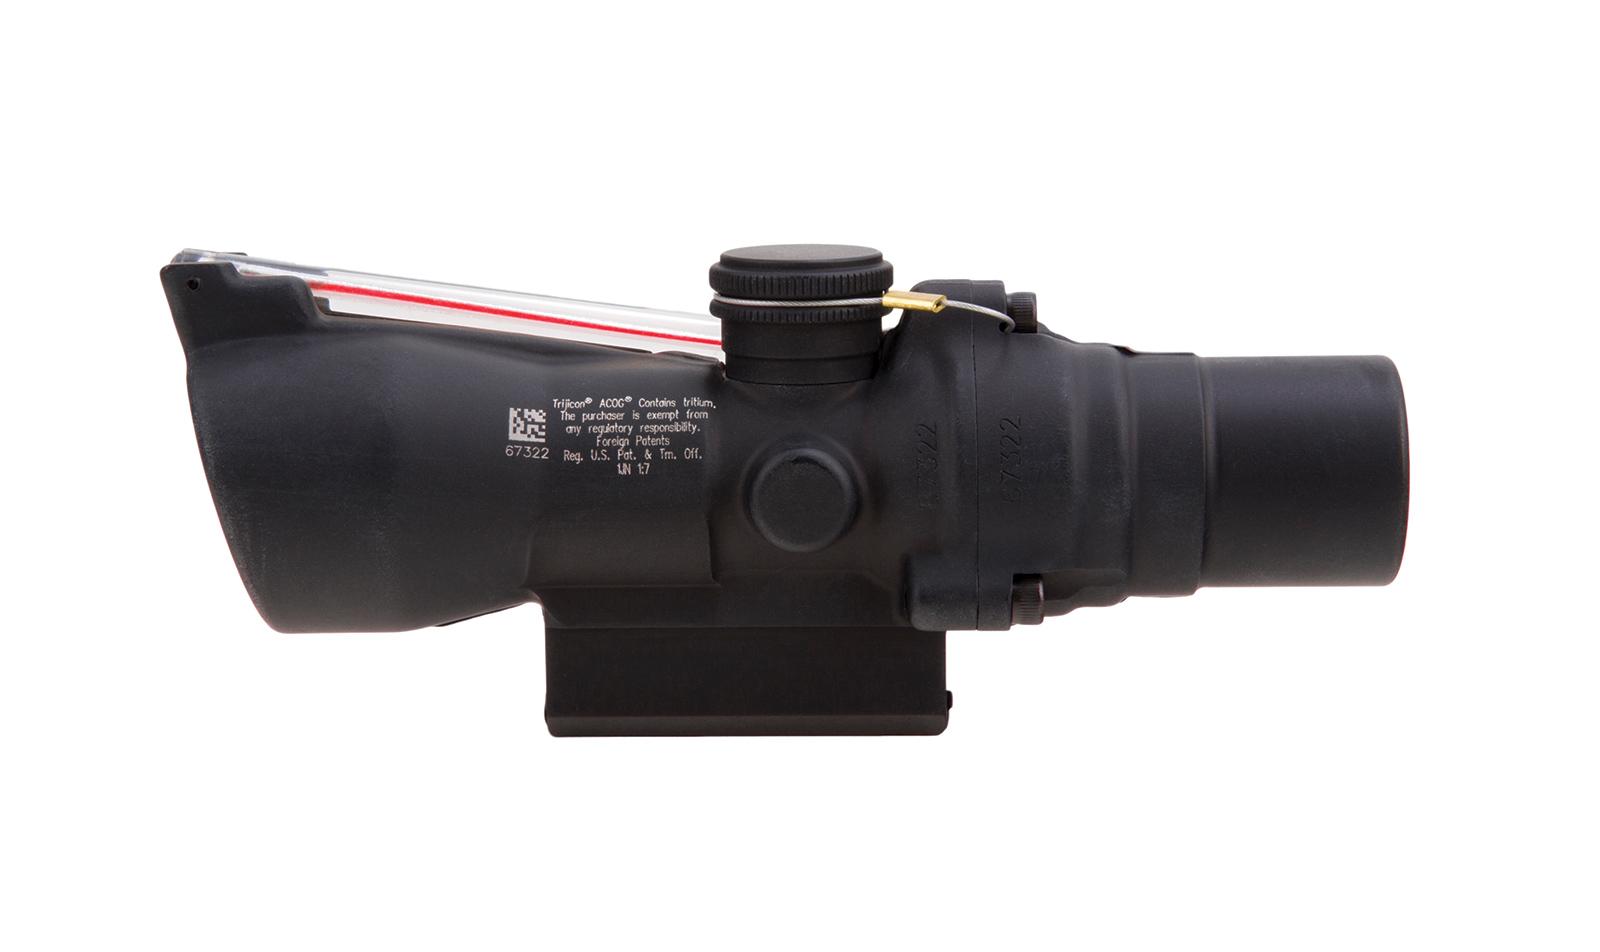 TA47-C-400152 angle 2